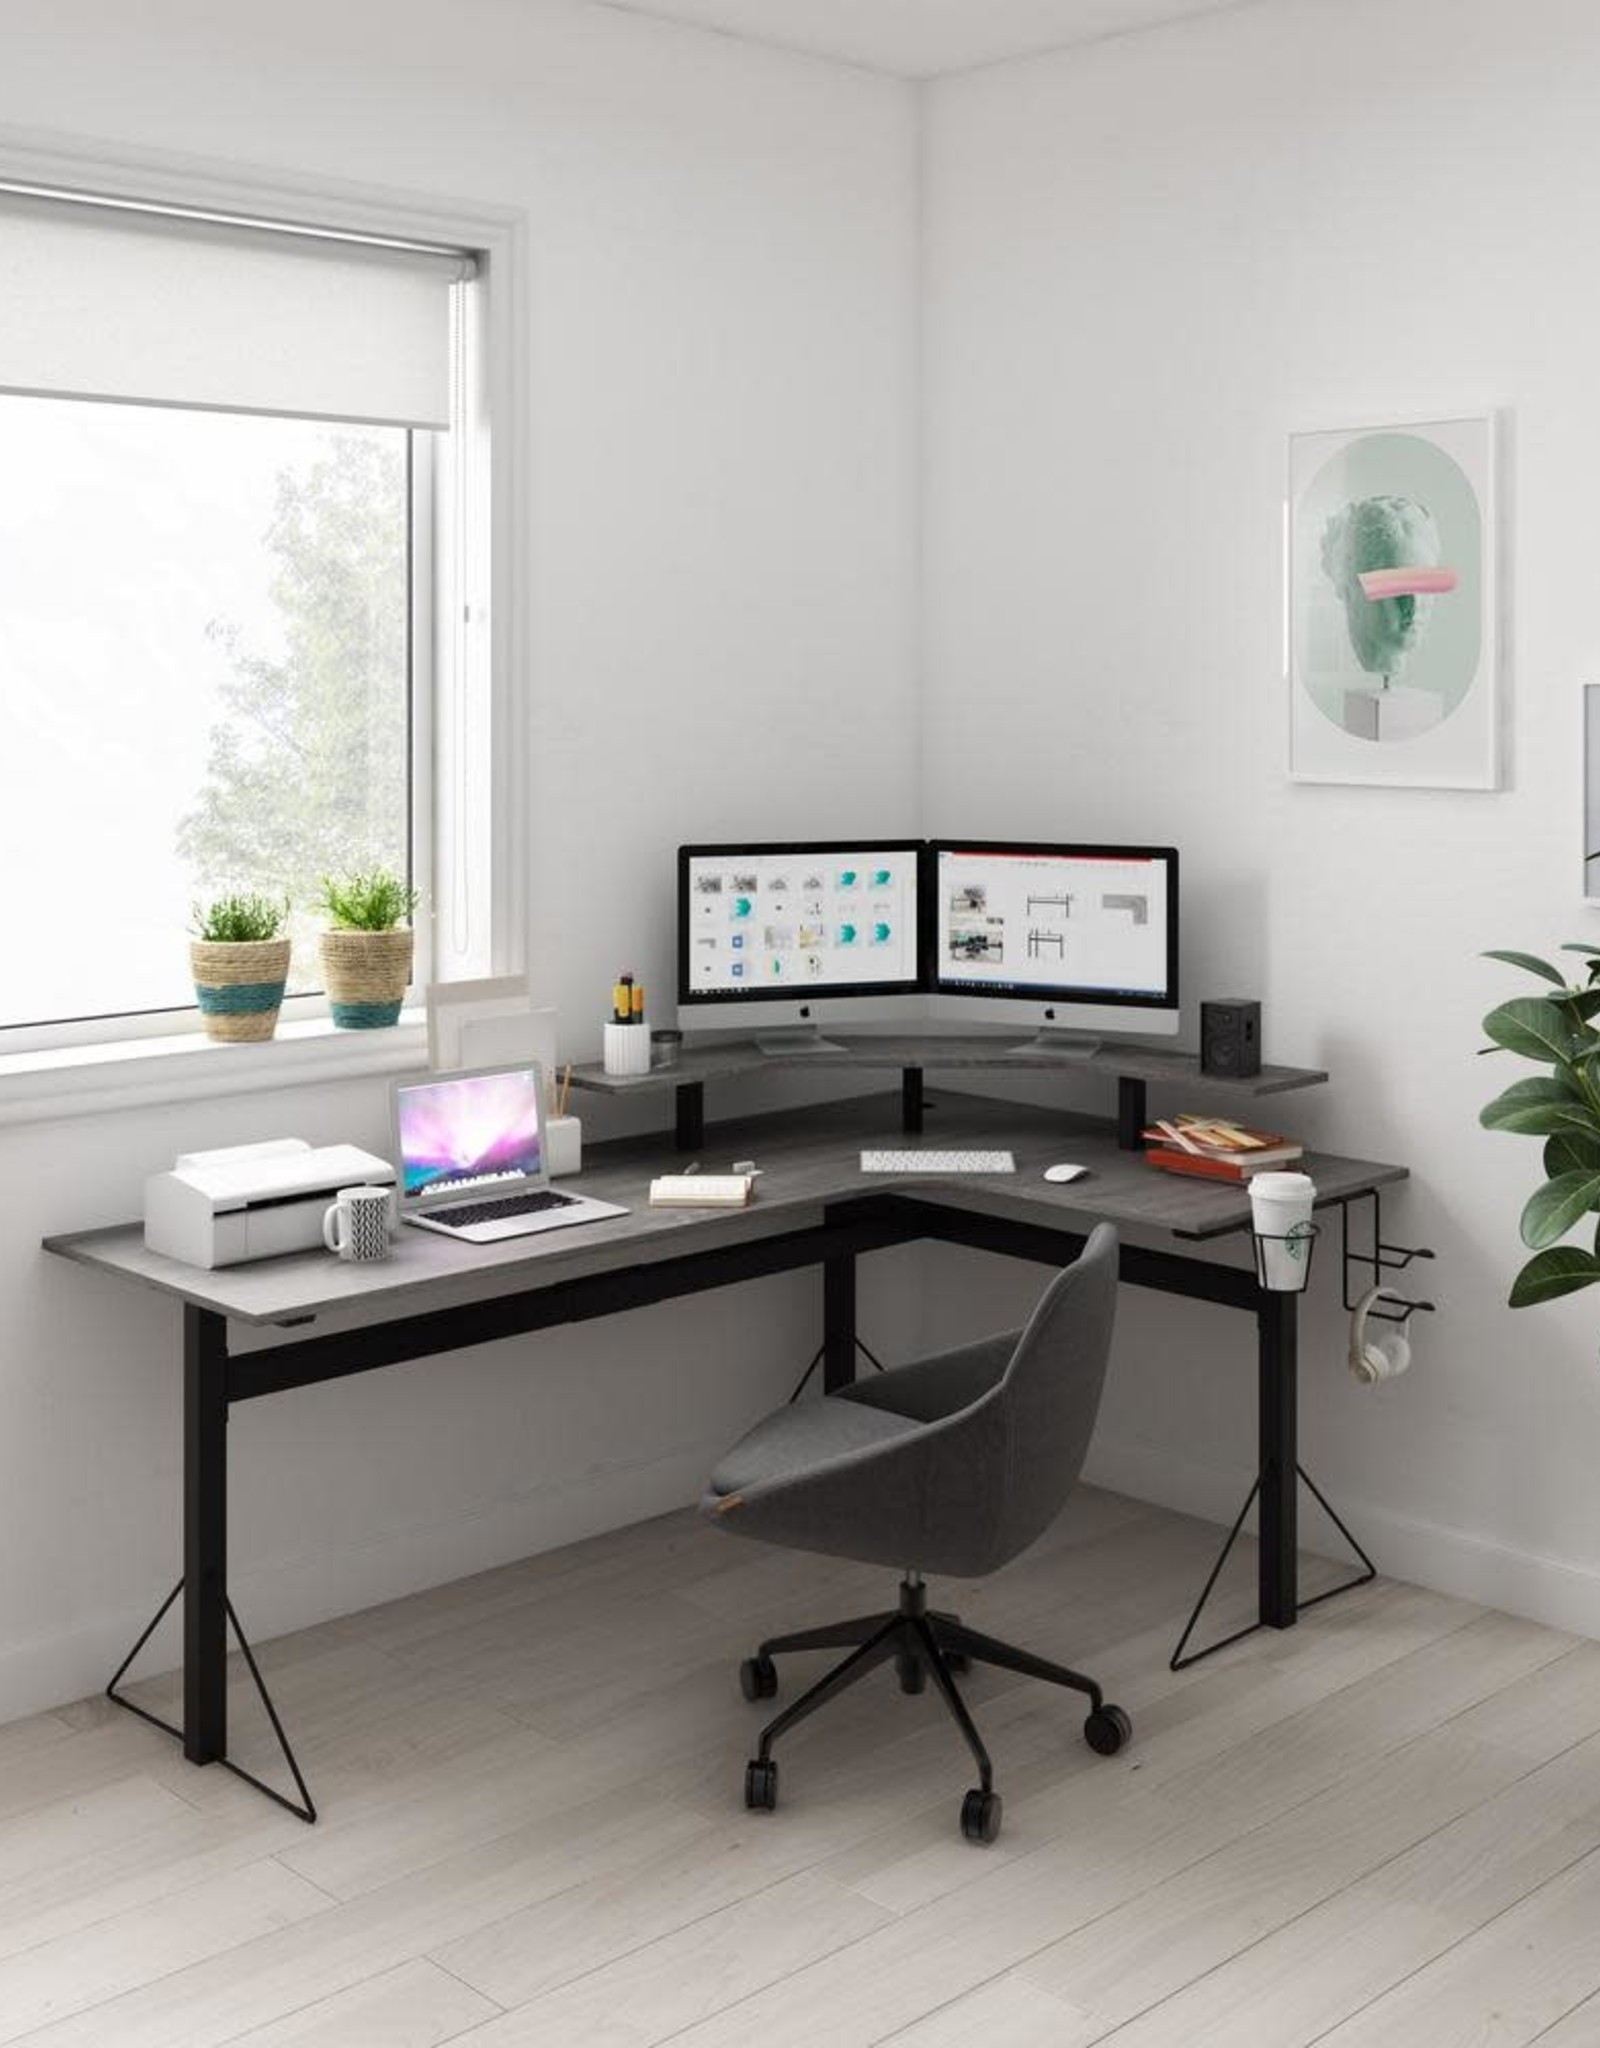 Jamesdar 78 in. L-Shaped Gray/Black Computer Desk with Shelf